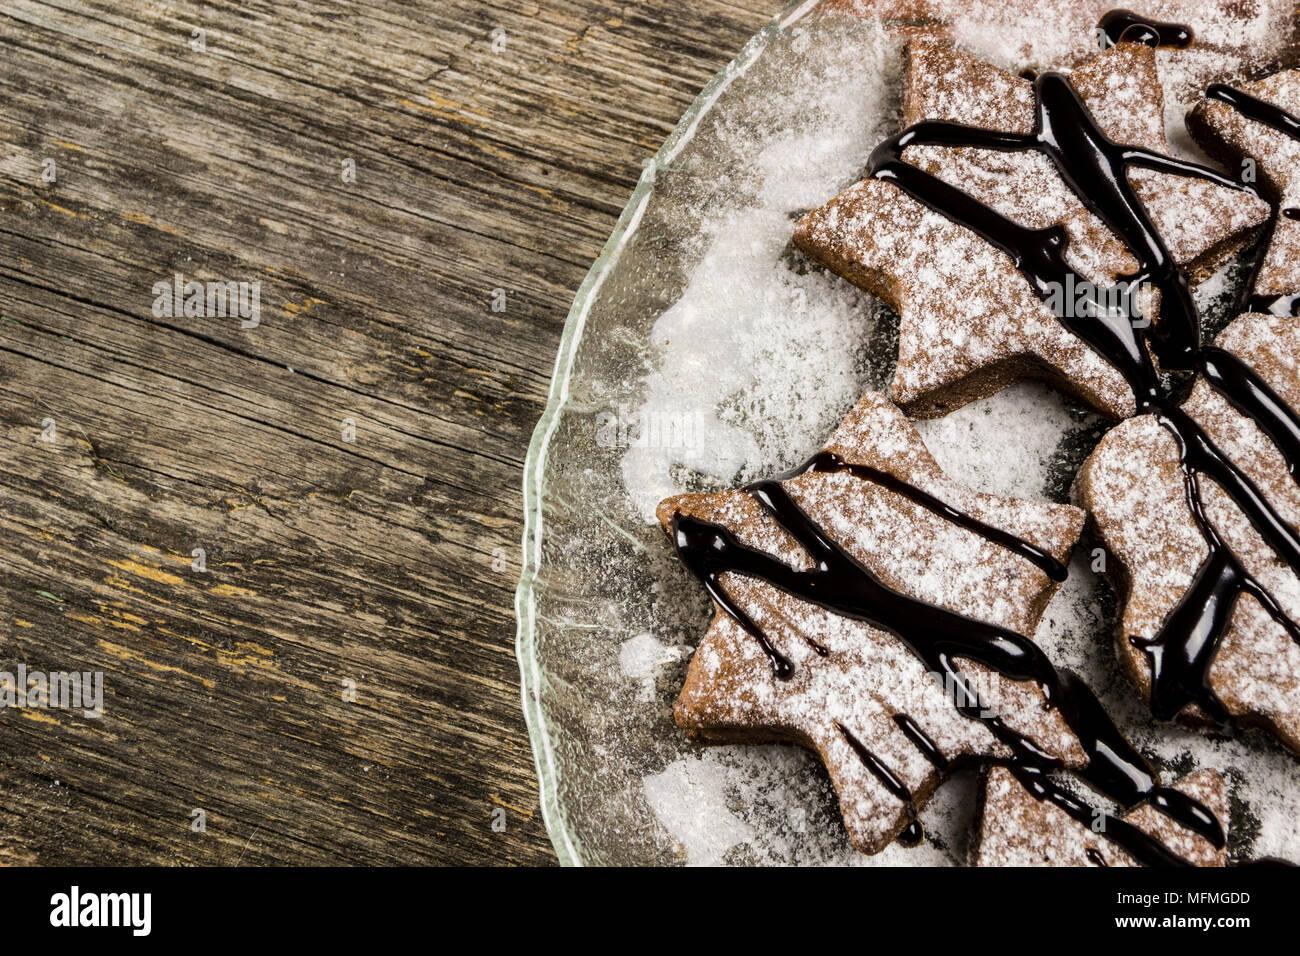 Galletas de jengibre con crema de chocolate sobre un fondo de madera Imagen De Stock